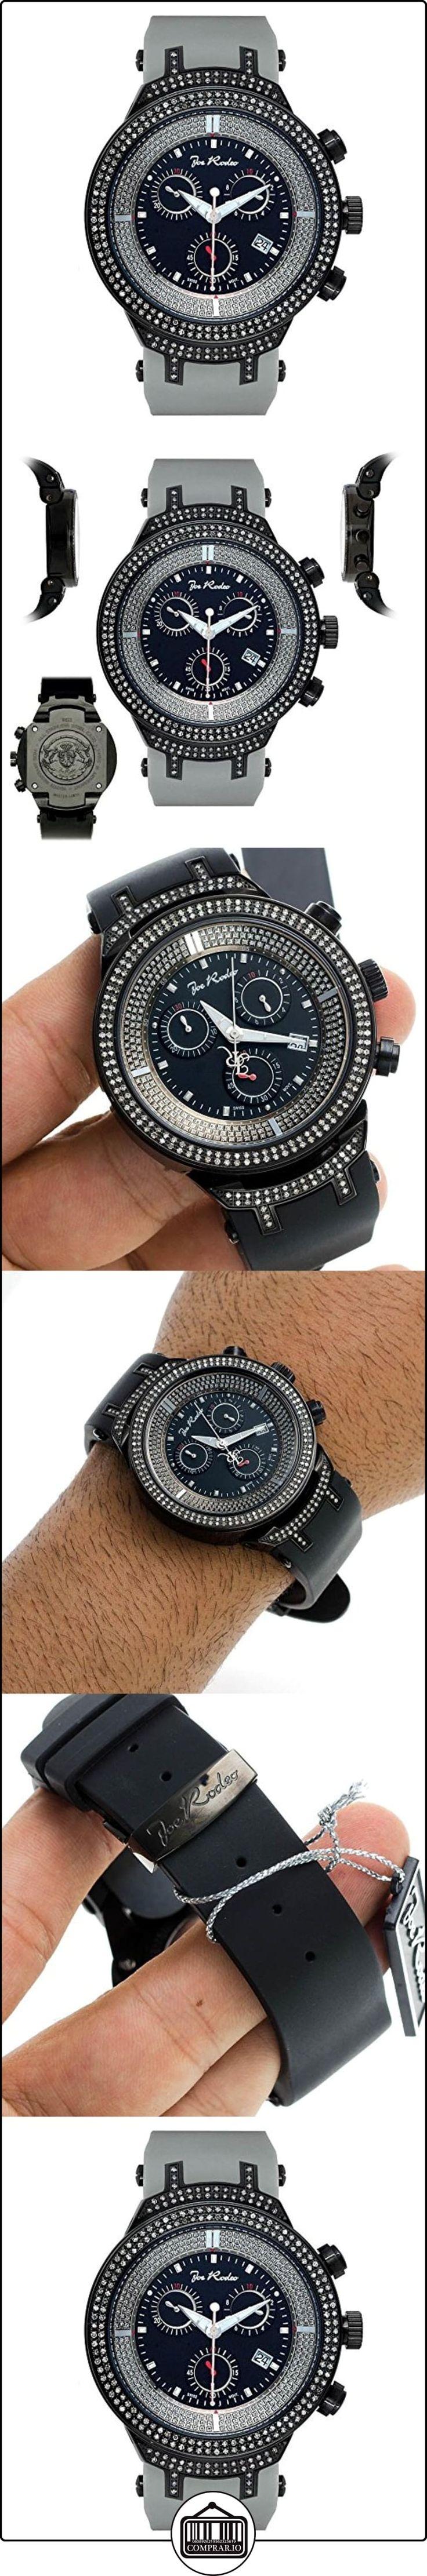 JOE RODEO Diamond Reloj para hombre-Master Negro 2.2quilates  ✿ Relojes para hombre - (Lujo) ✿